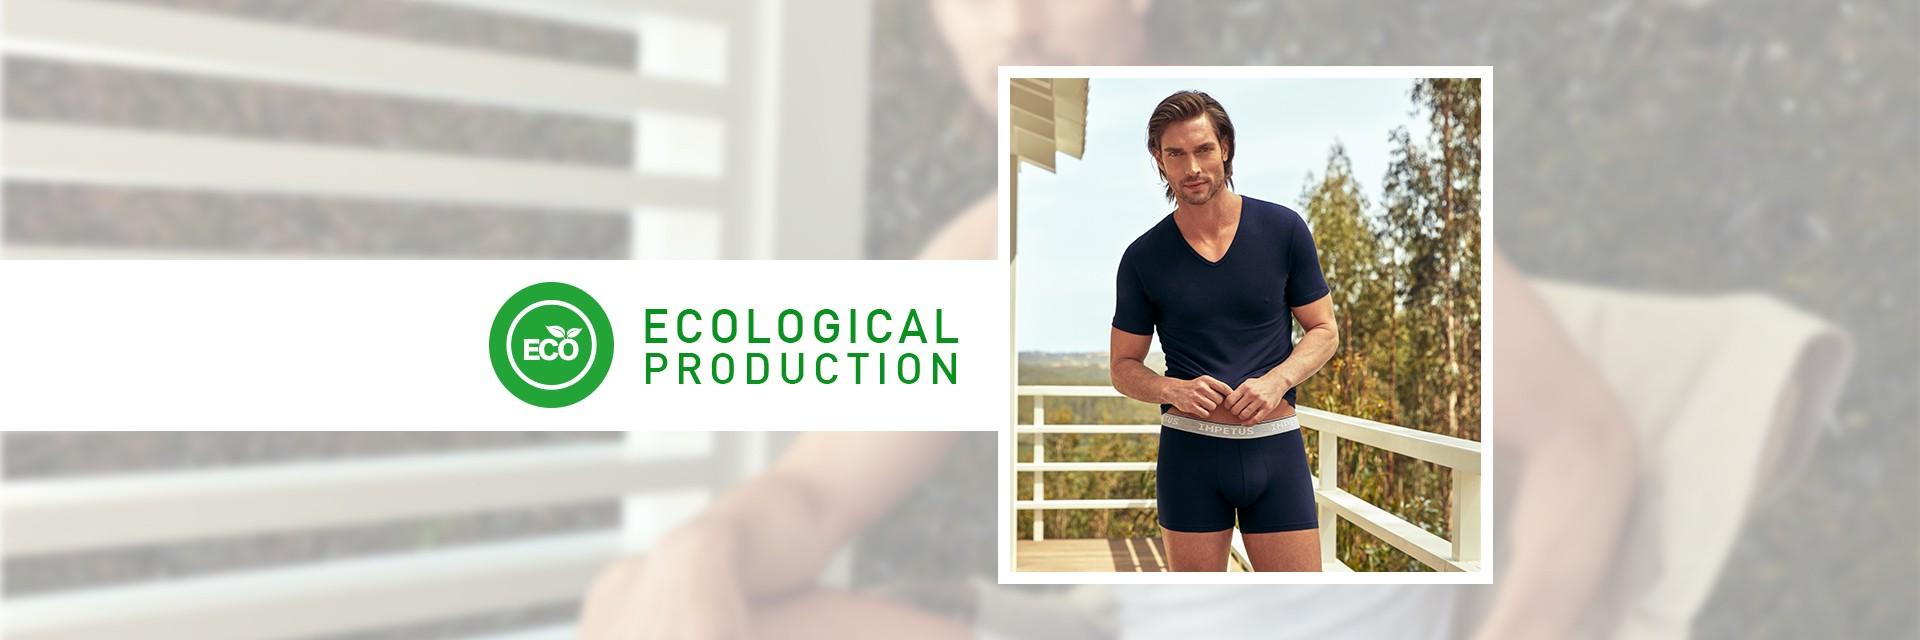 Collection of underwear based on organic fibers   Impetus Underwear_1